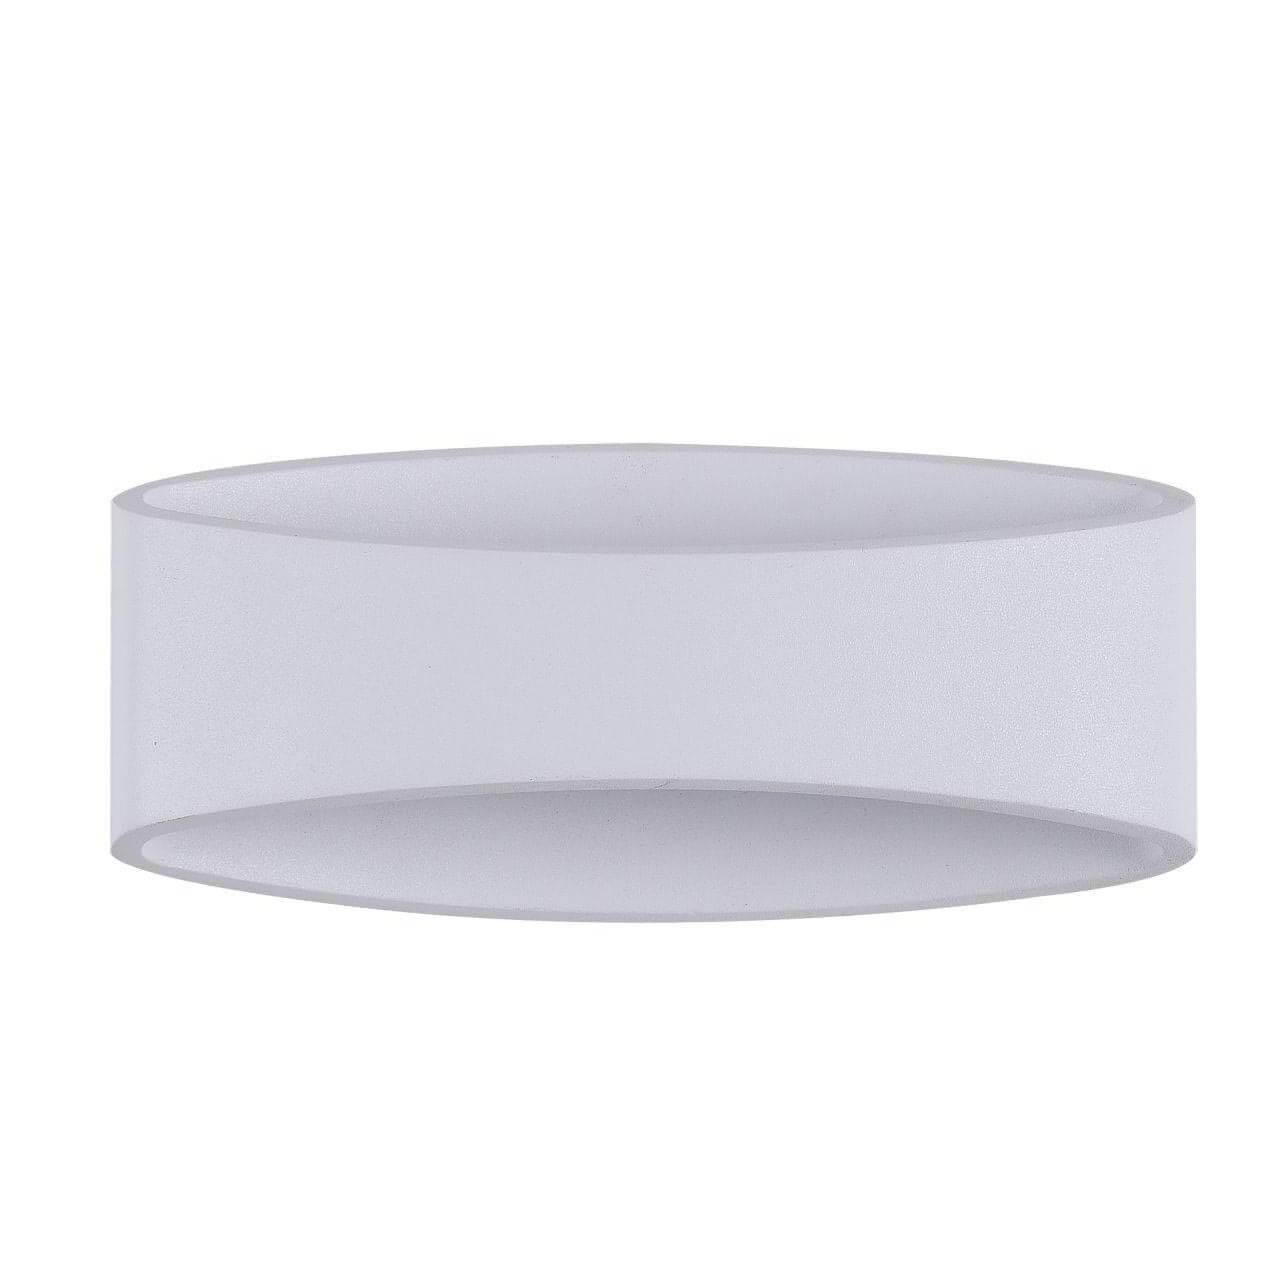 Фото - Настенный светильник Maytoni C806WL-L5W, LED, 5 Вт фонарь jazzway alum1 l5w